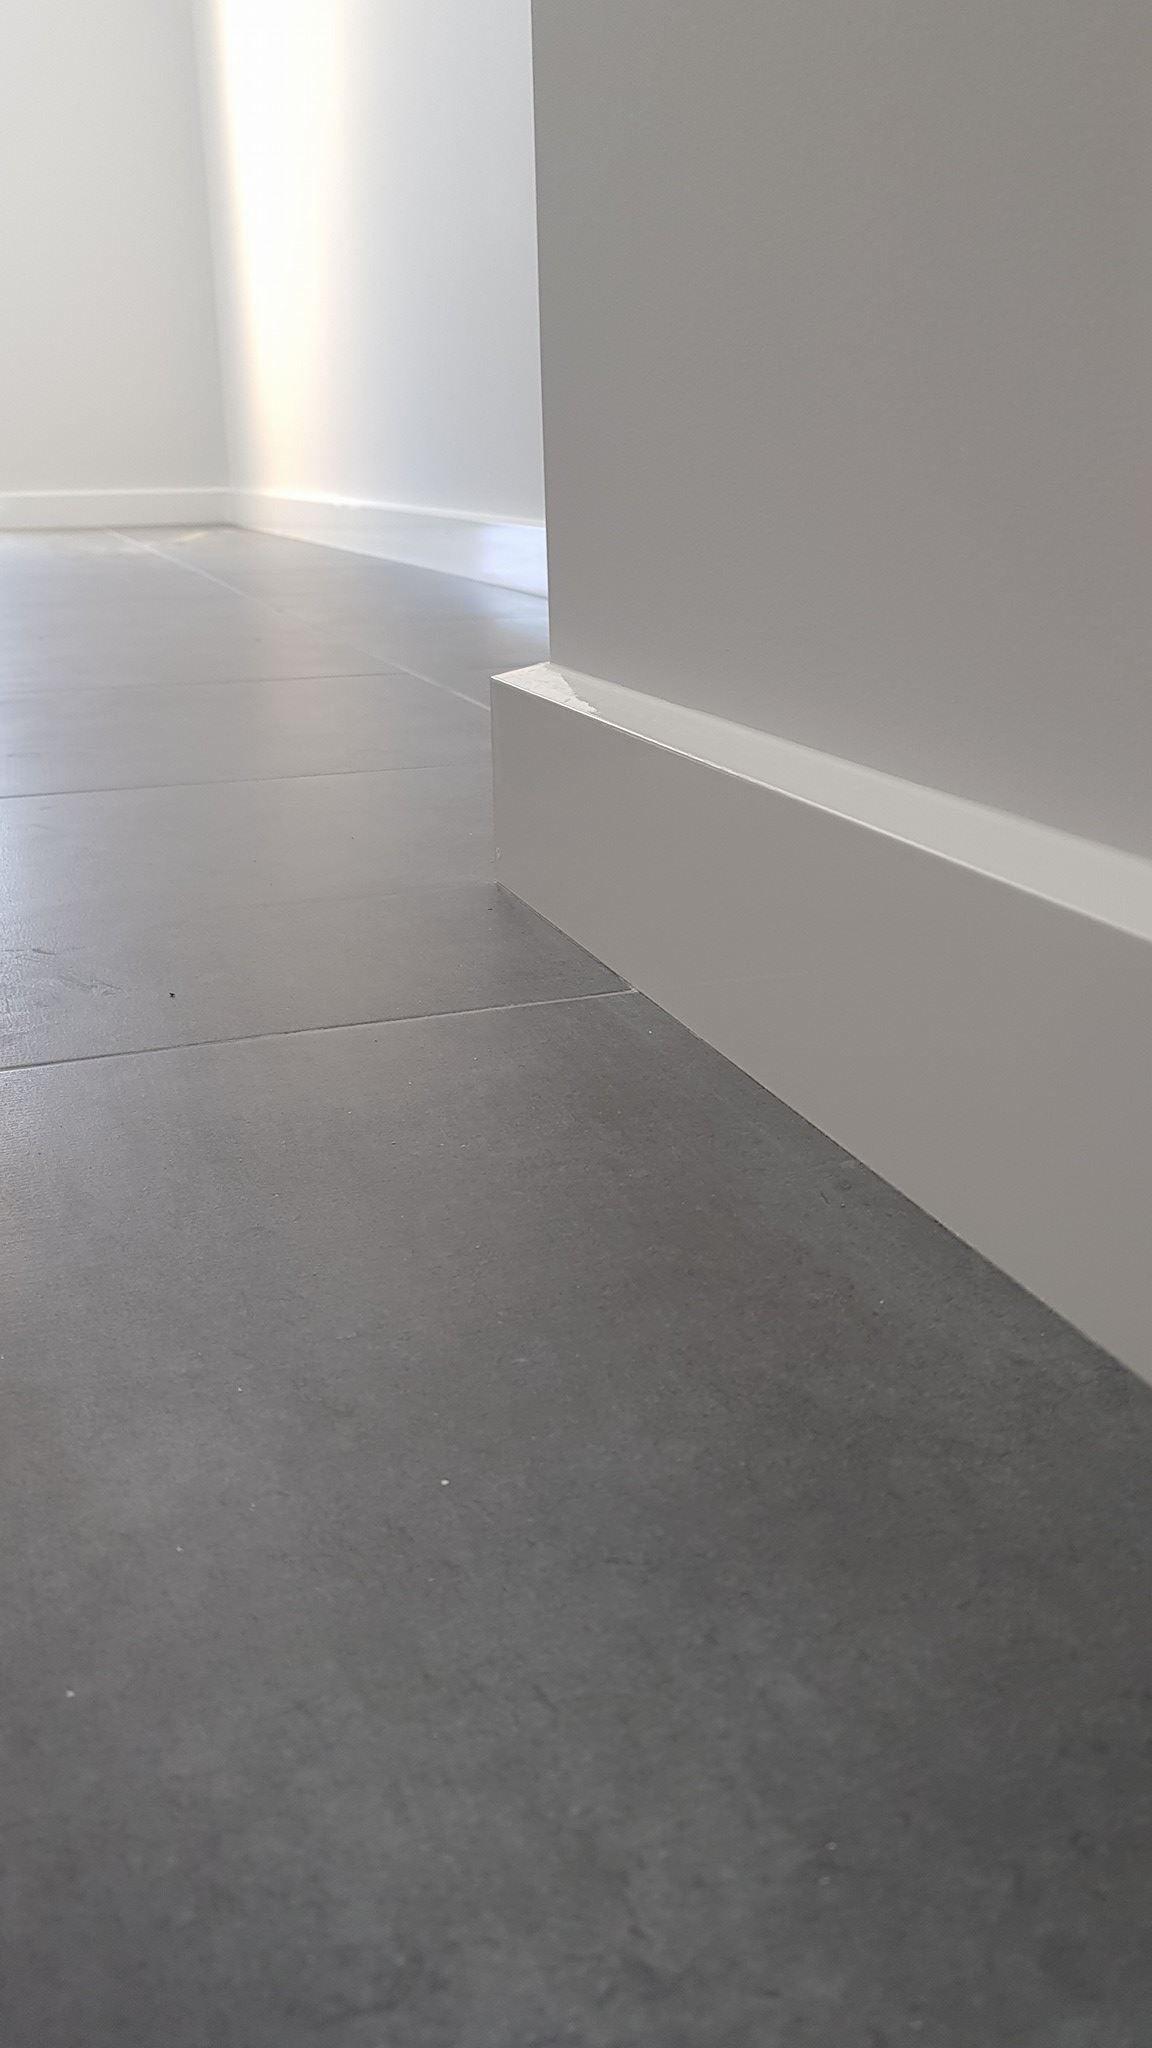 92mm Bevelled Skirting Boards Spray Painted In Oil Based Paint Modern Skirting Boards Minimalistic Skirting Boards House Skirting Minimalist Interior Design